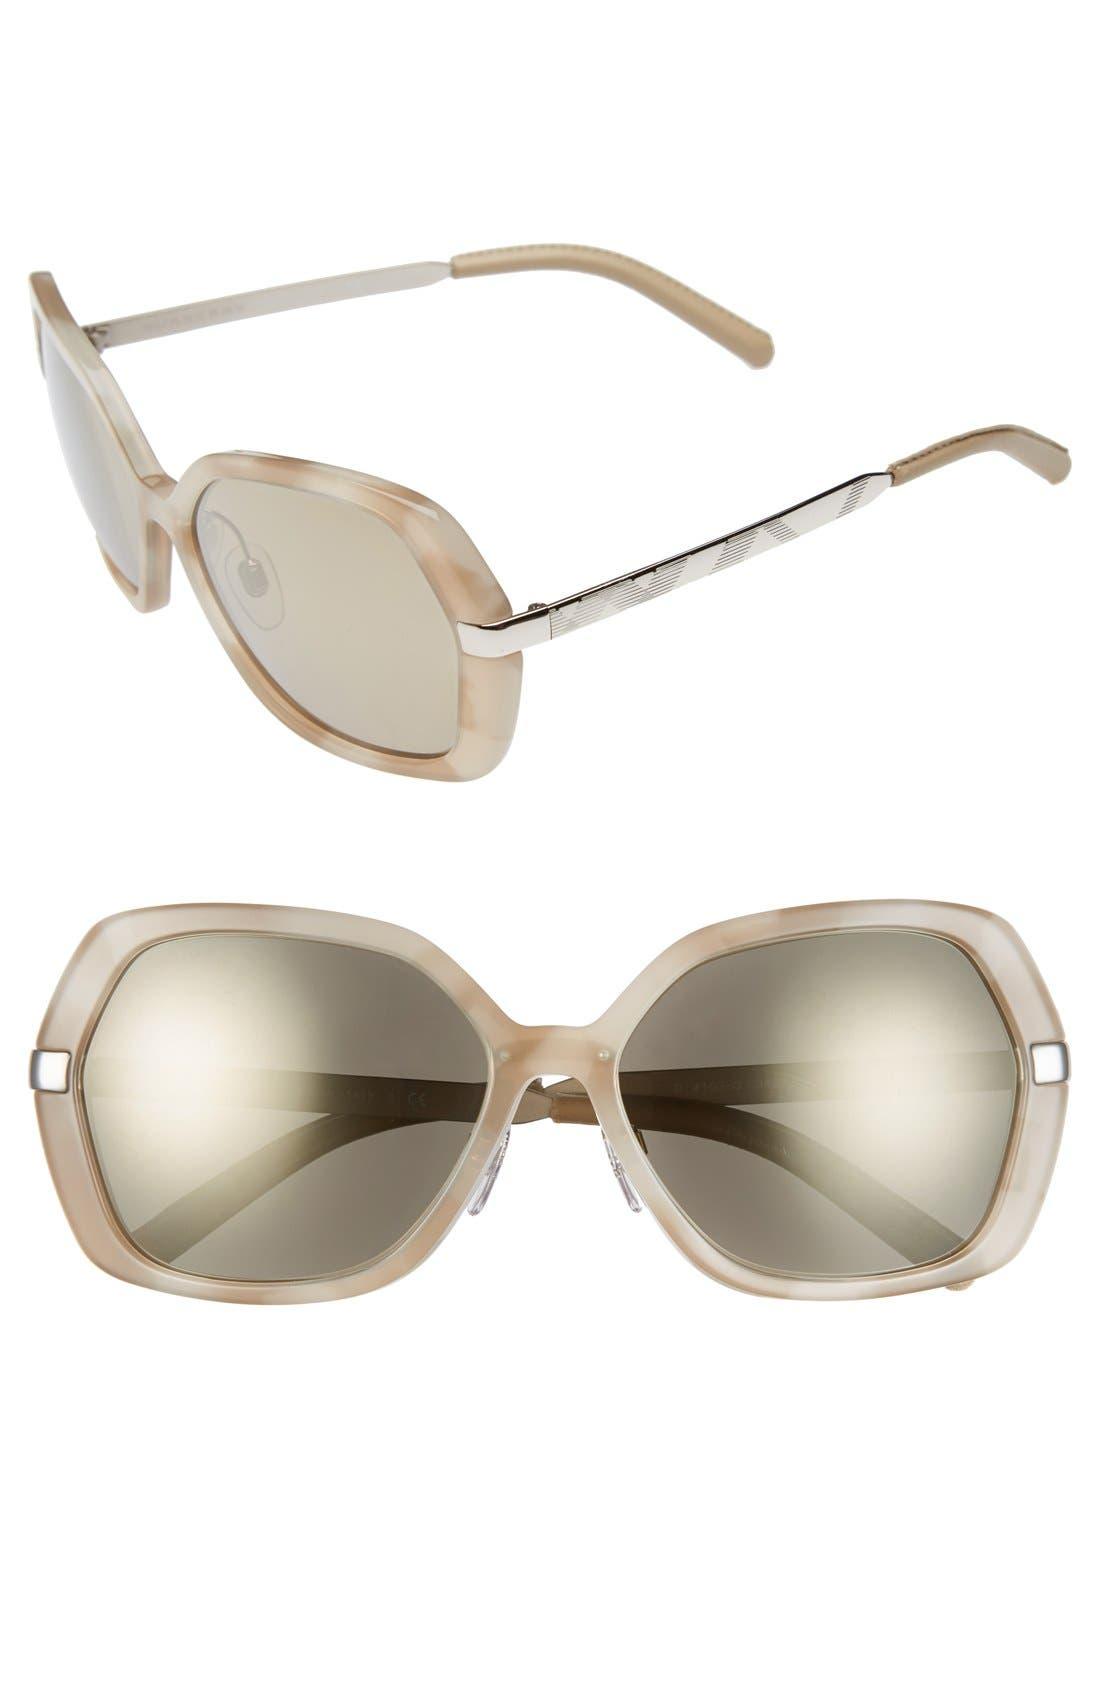 Main Image - Burberry 'Classic' 58mm Sunglasses